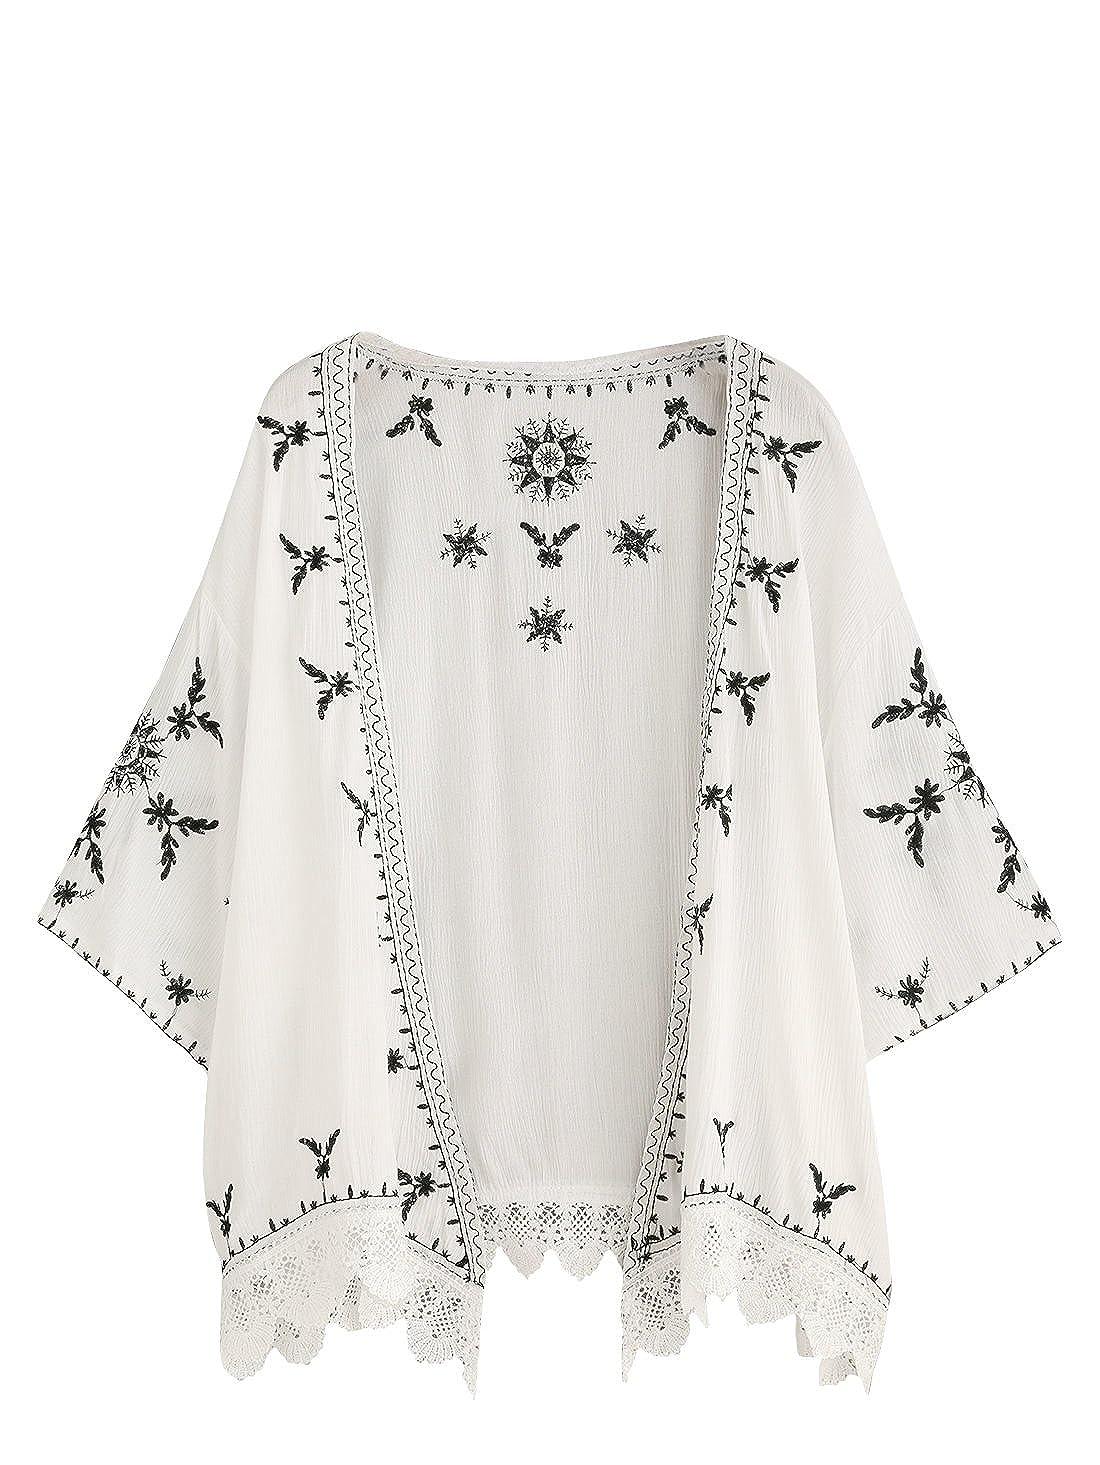 75f2d3652a SweatyRocks Women s Floral Lace Crochet Kimono Cardigan Beach Wear Cover up  at Amazon Women s Clothing store